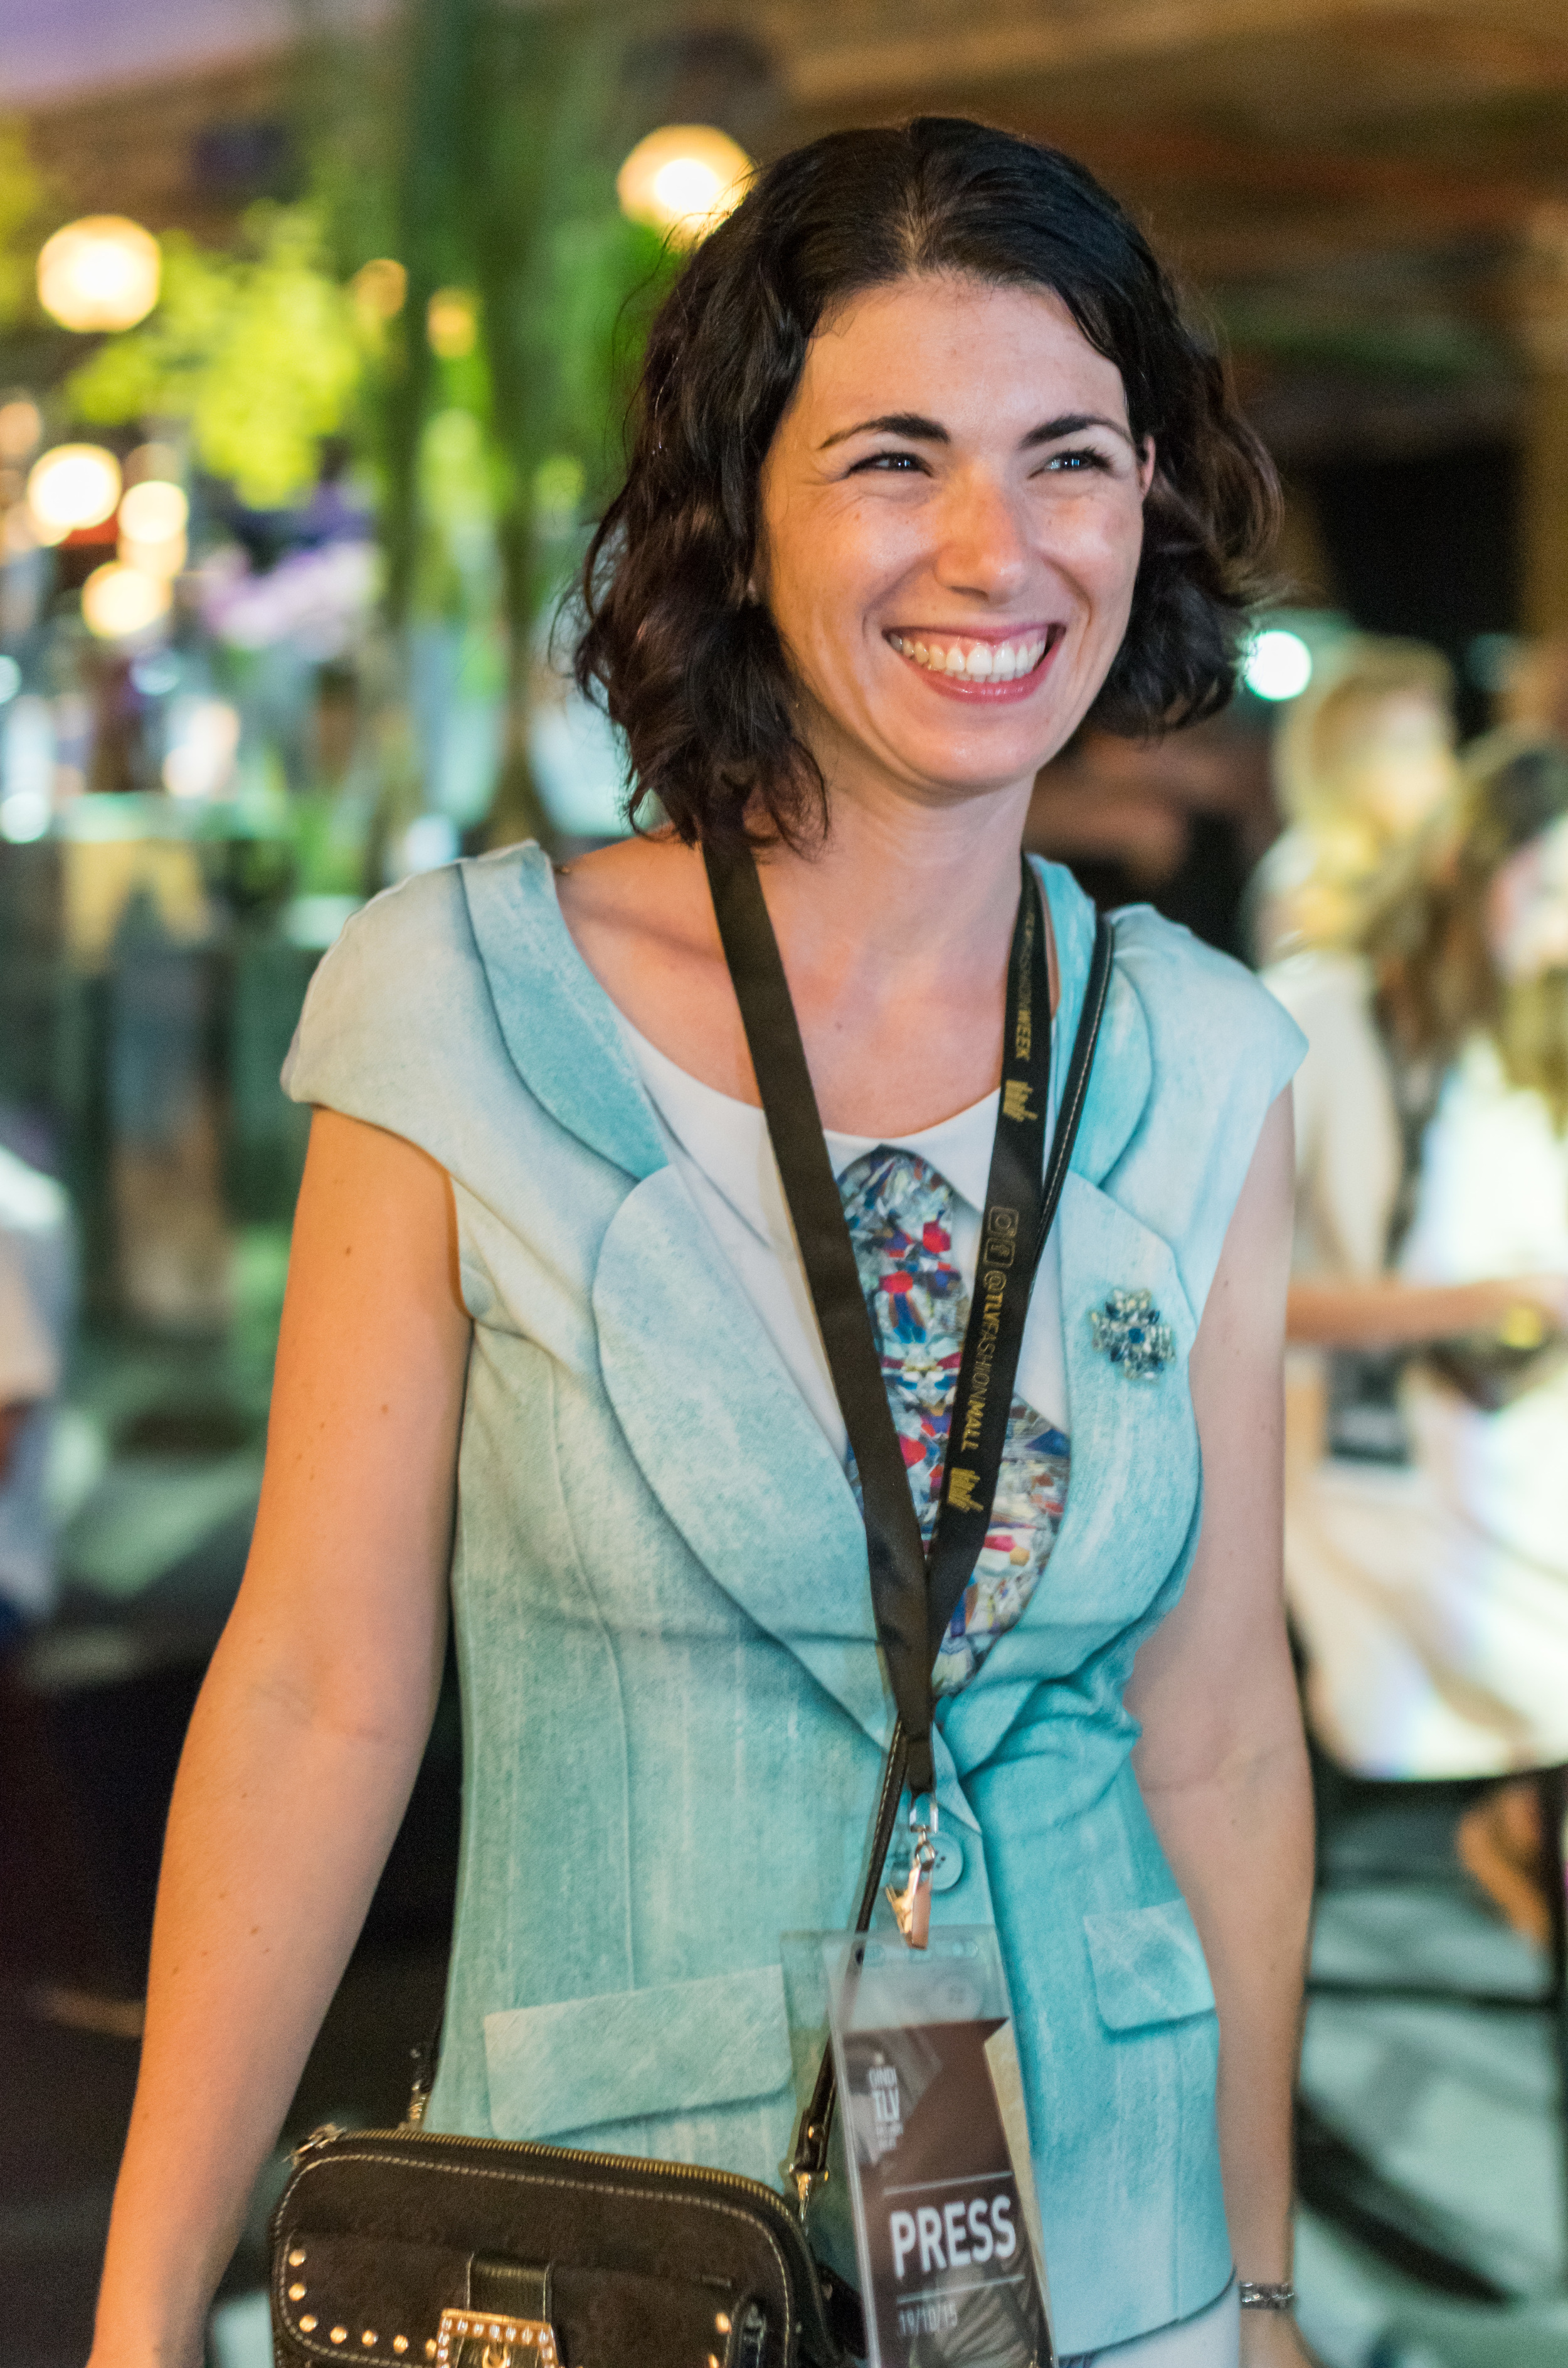 Vika Kanar of GeekChicTLV